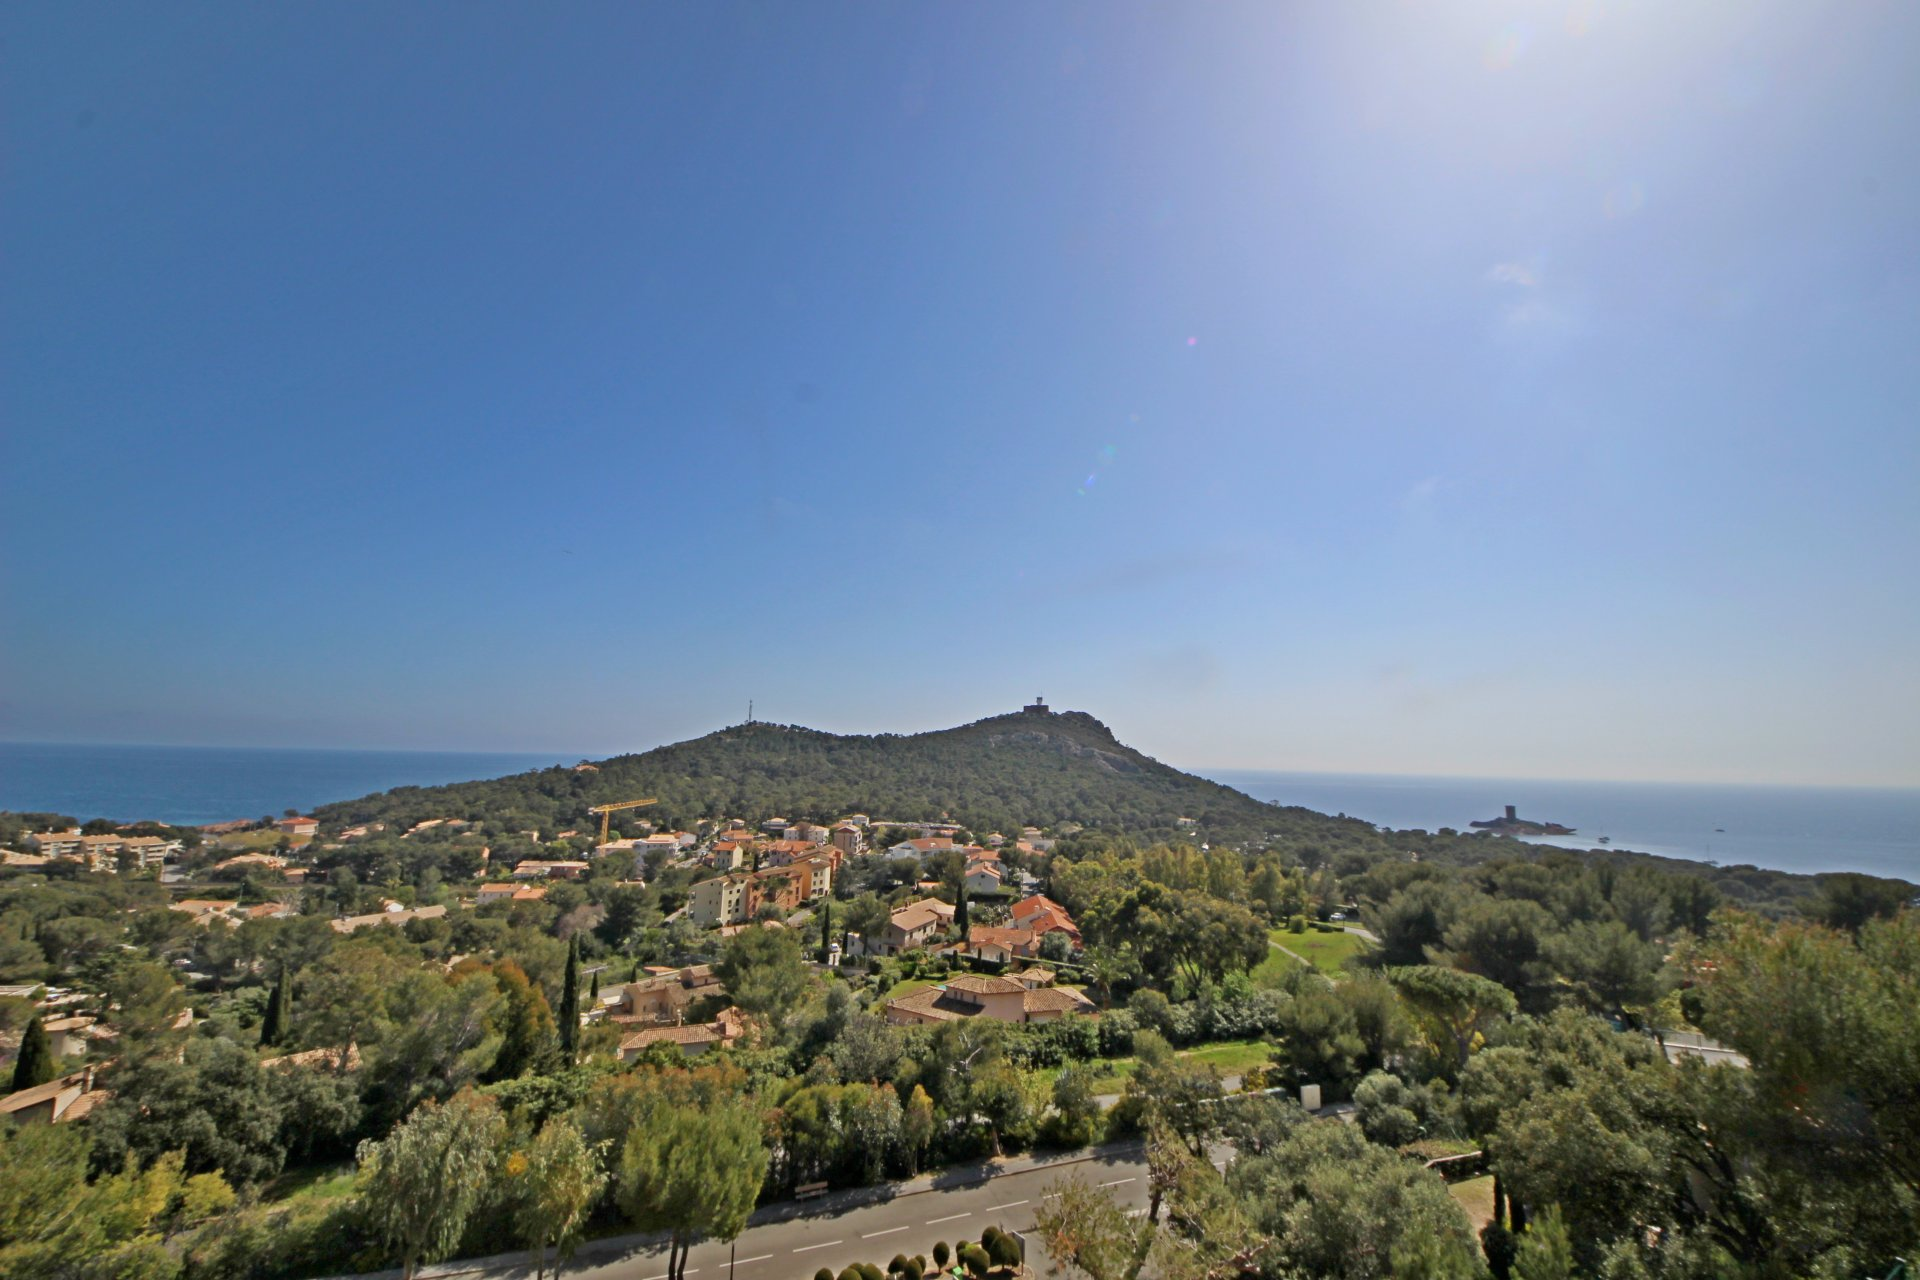 Appartamento di 3 locali Hameau de Cap Estérel magnifica vista sul mare